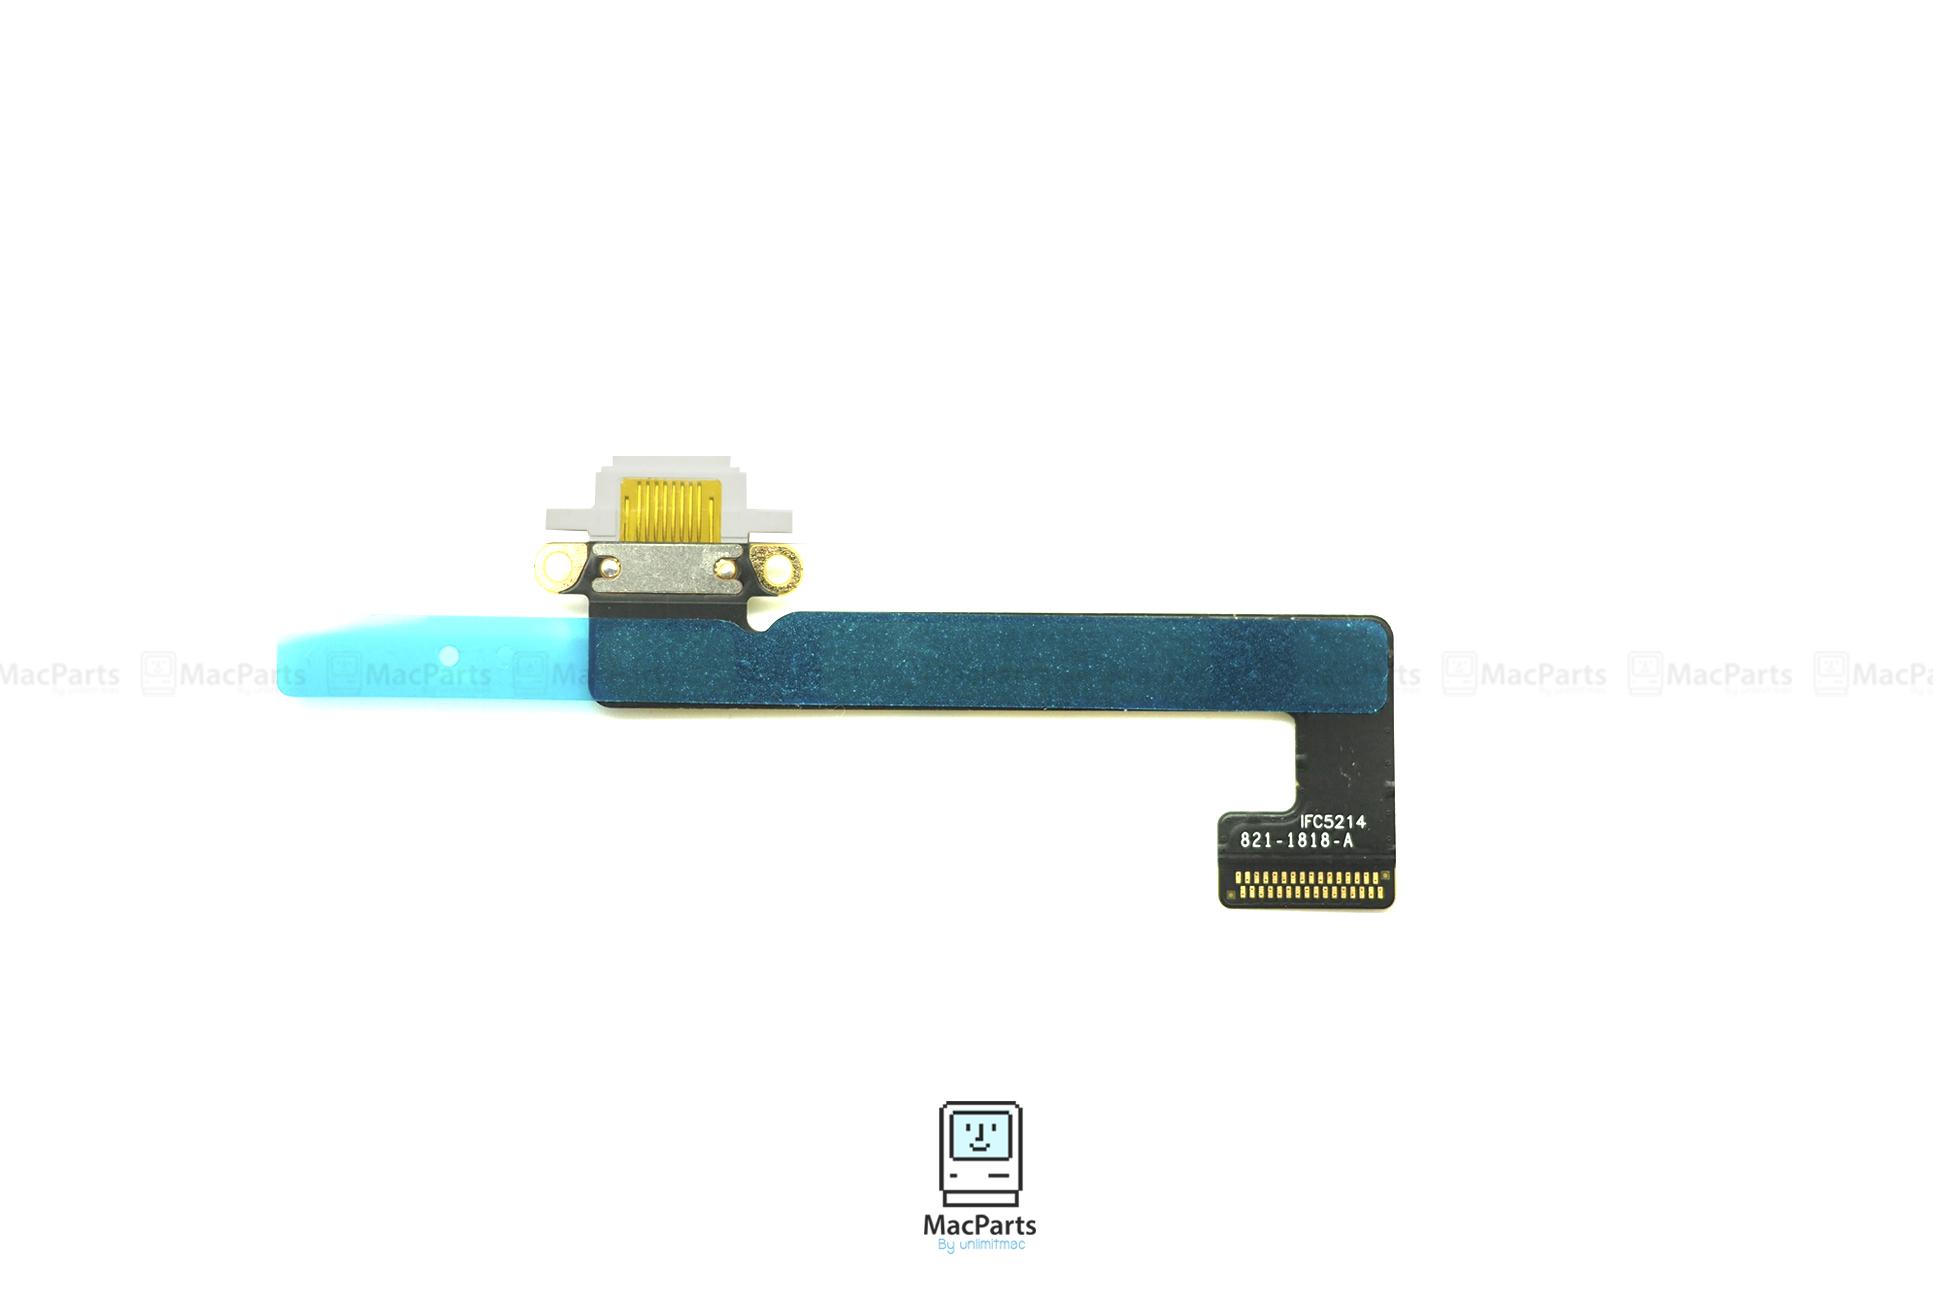 821-1818-A iPad mini 2,3 Lightning Connector White